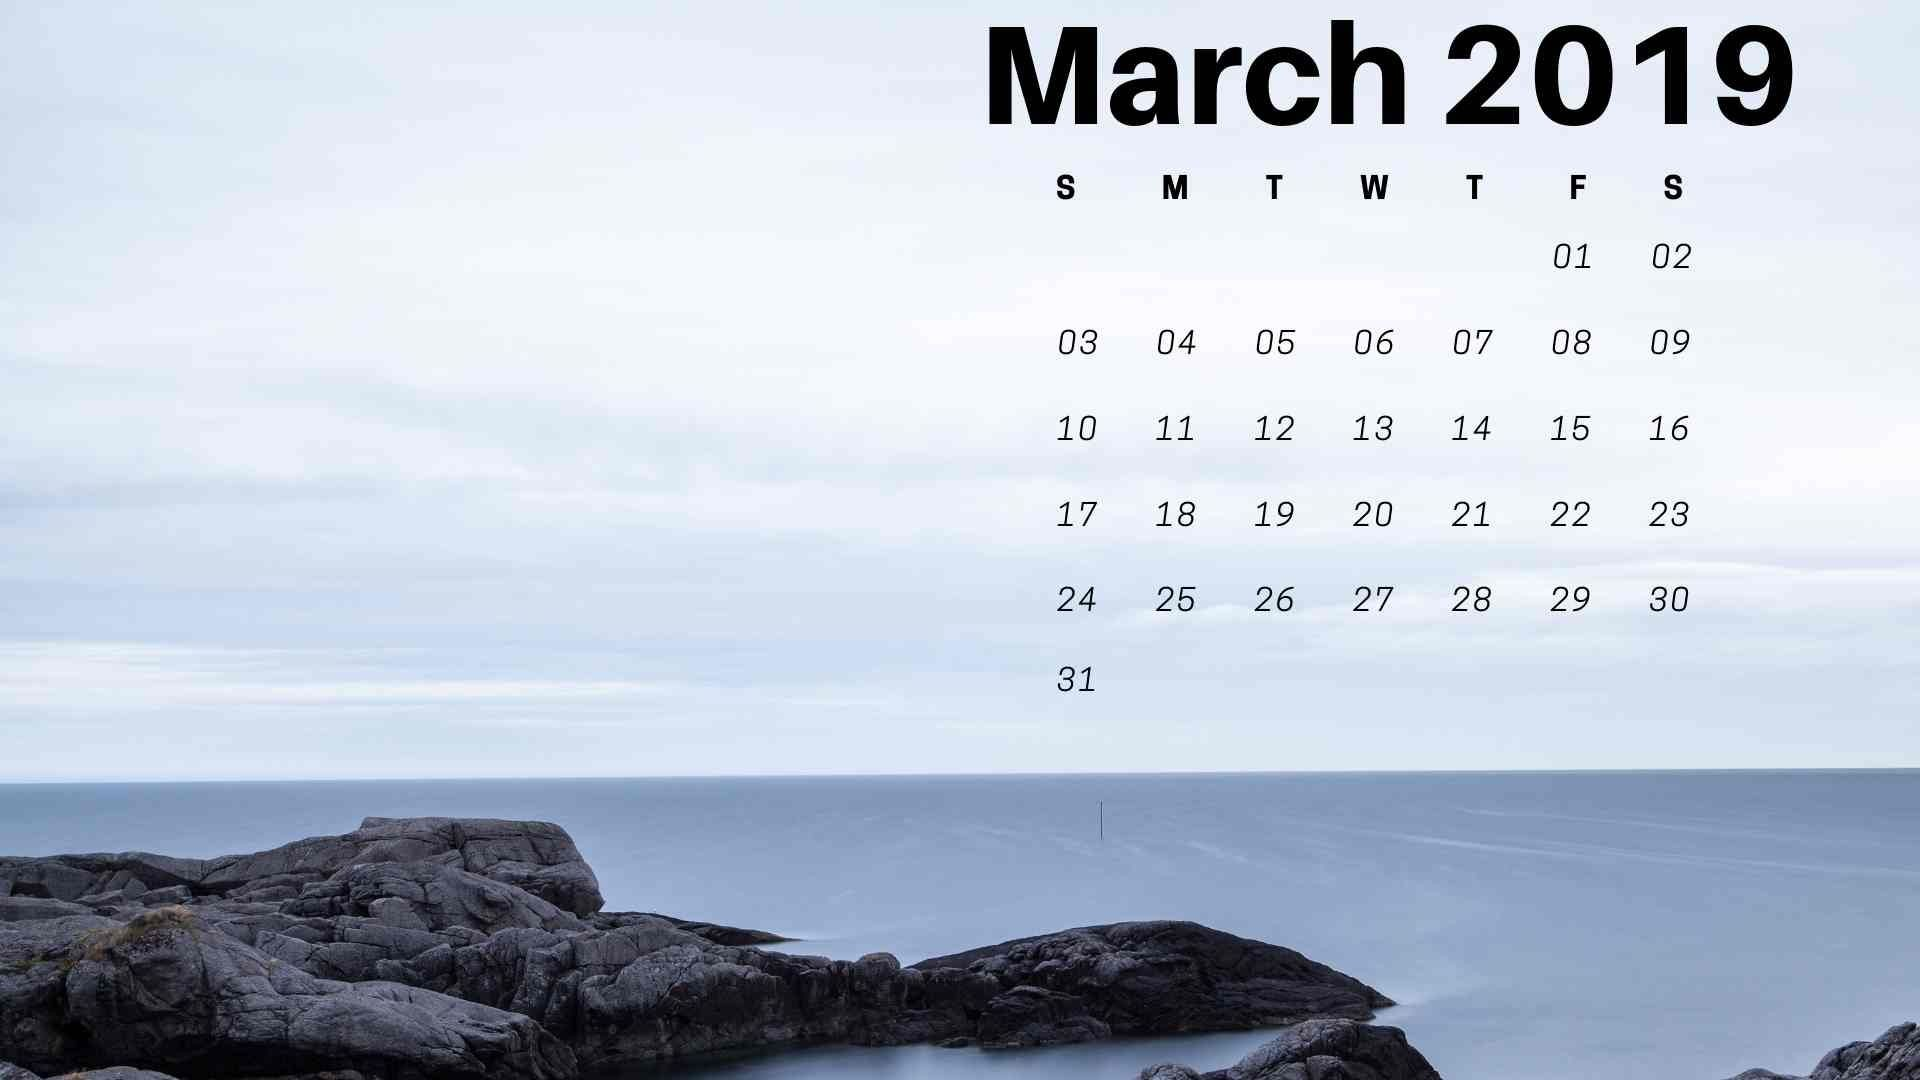 March 2019 Calendar Wallpaper Desktop march calendar calenda2019